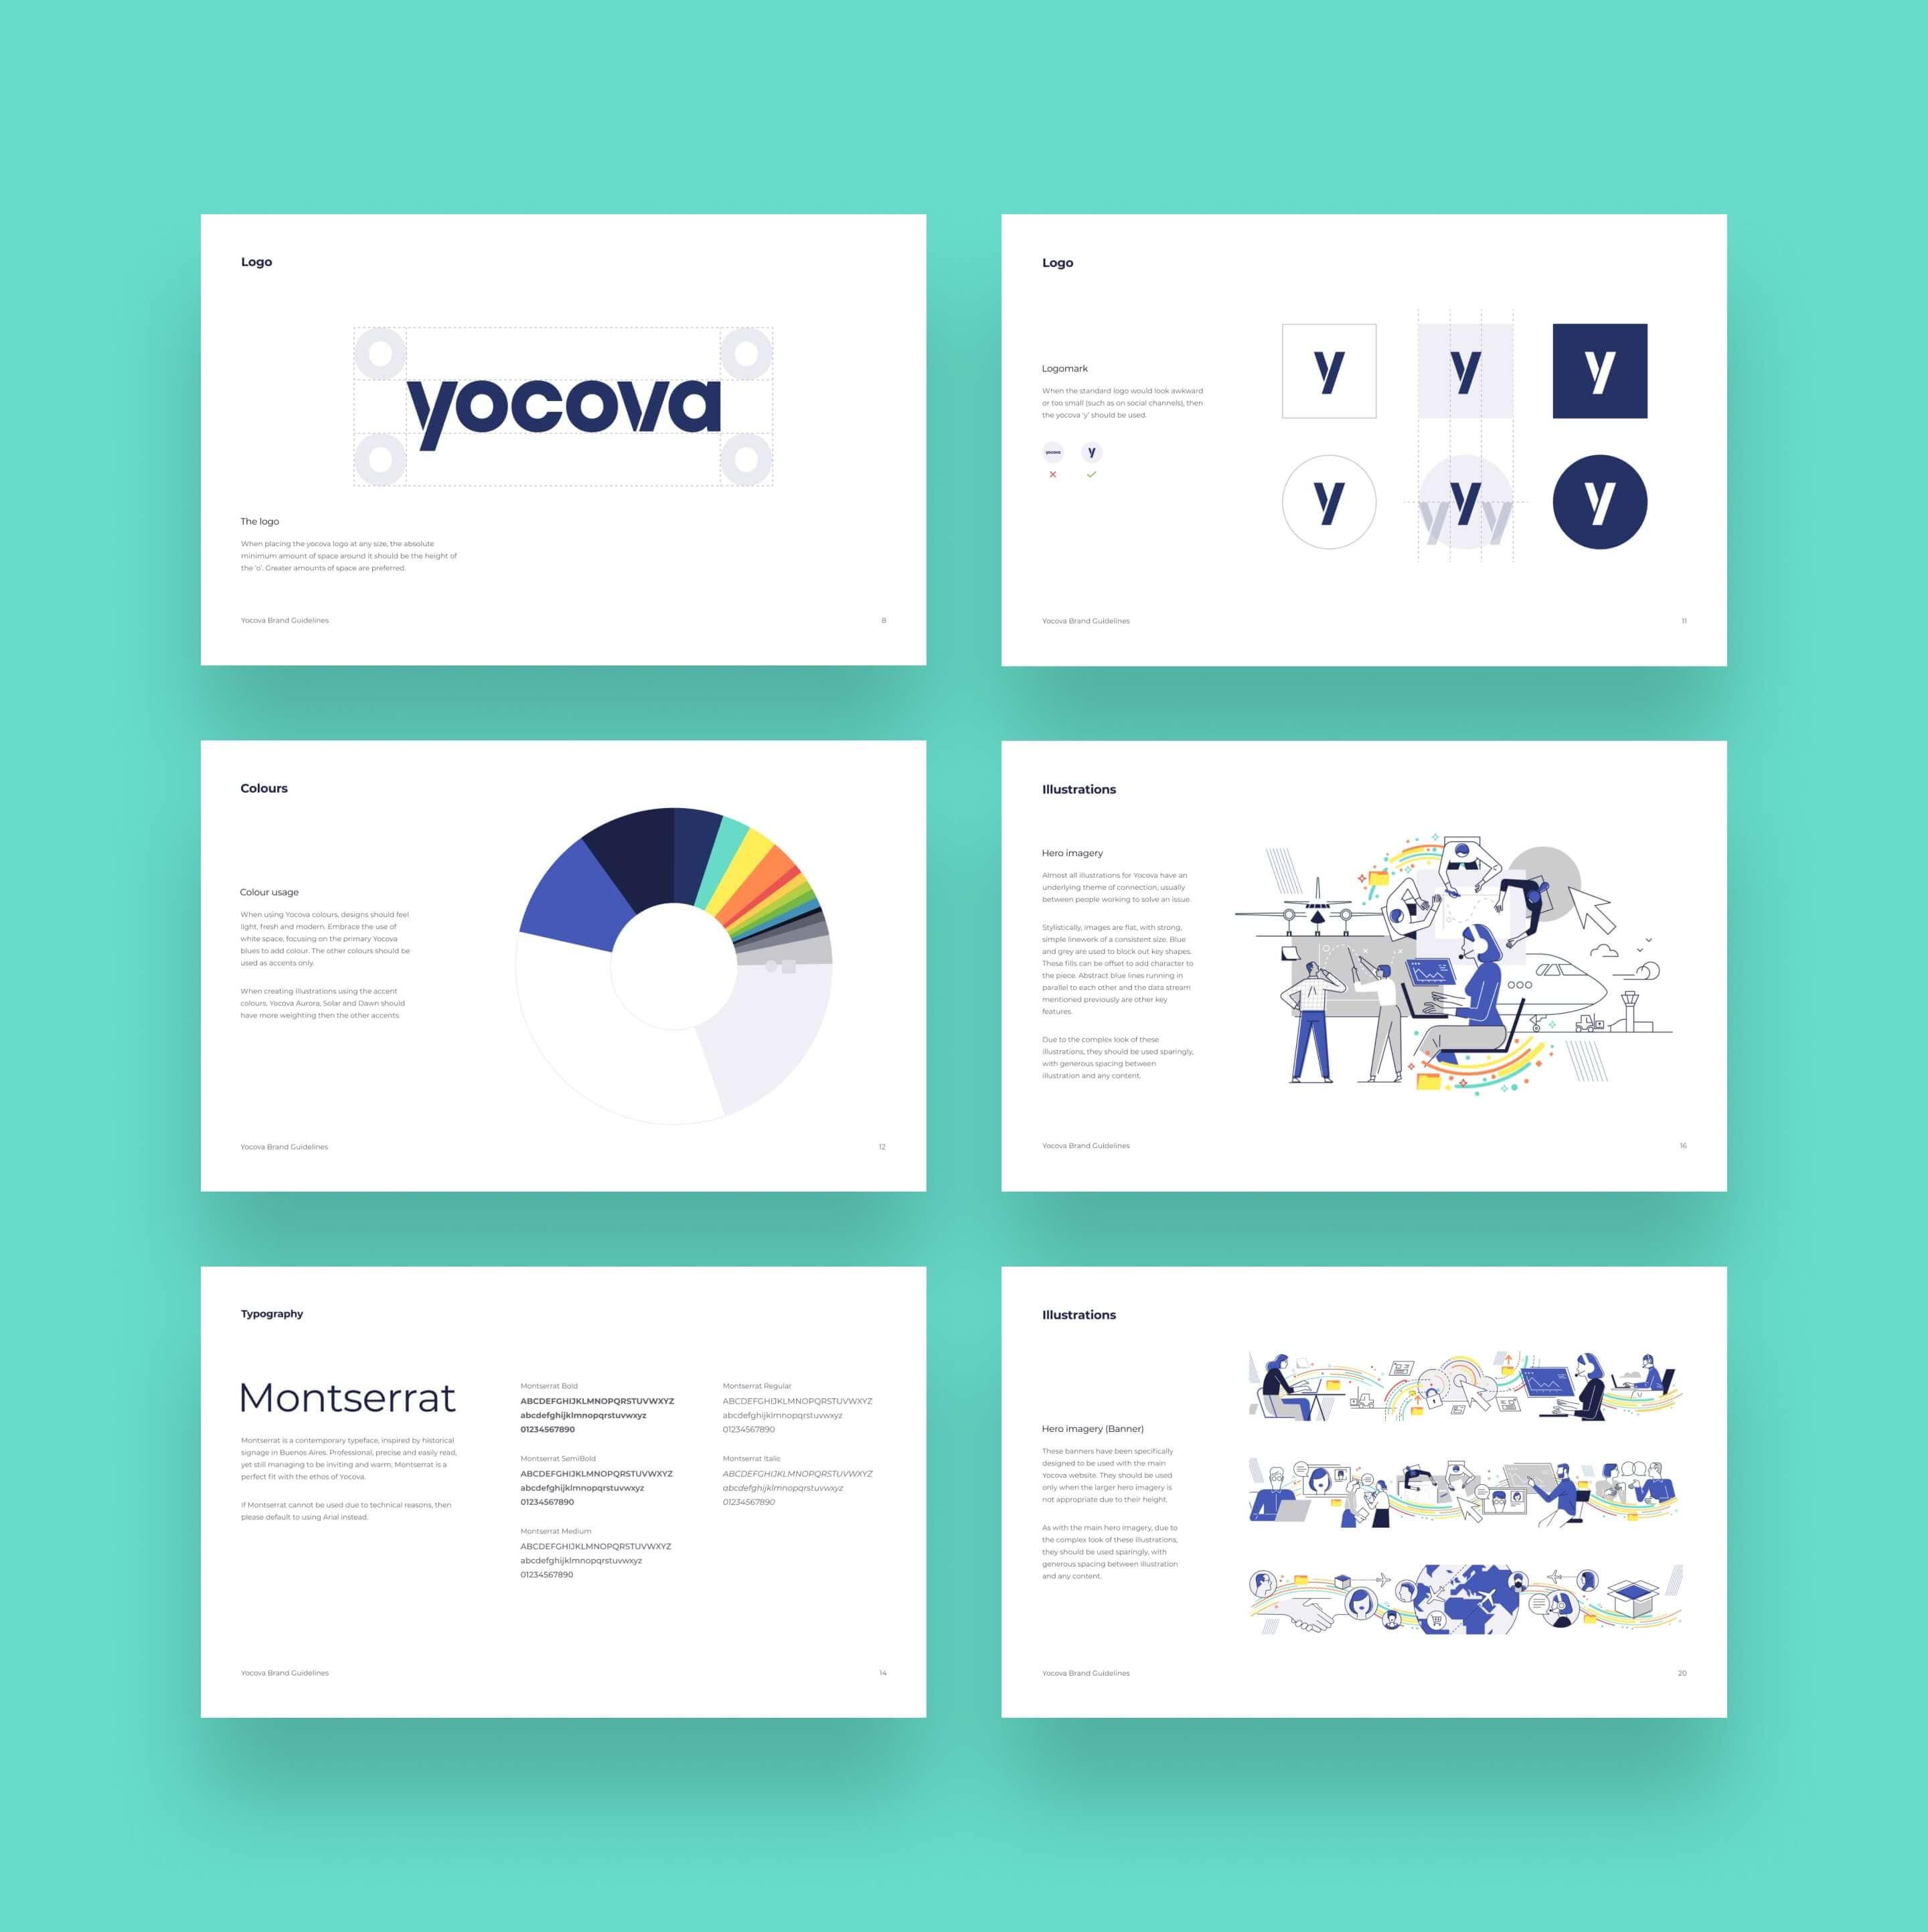 yocova_detail-1